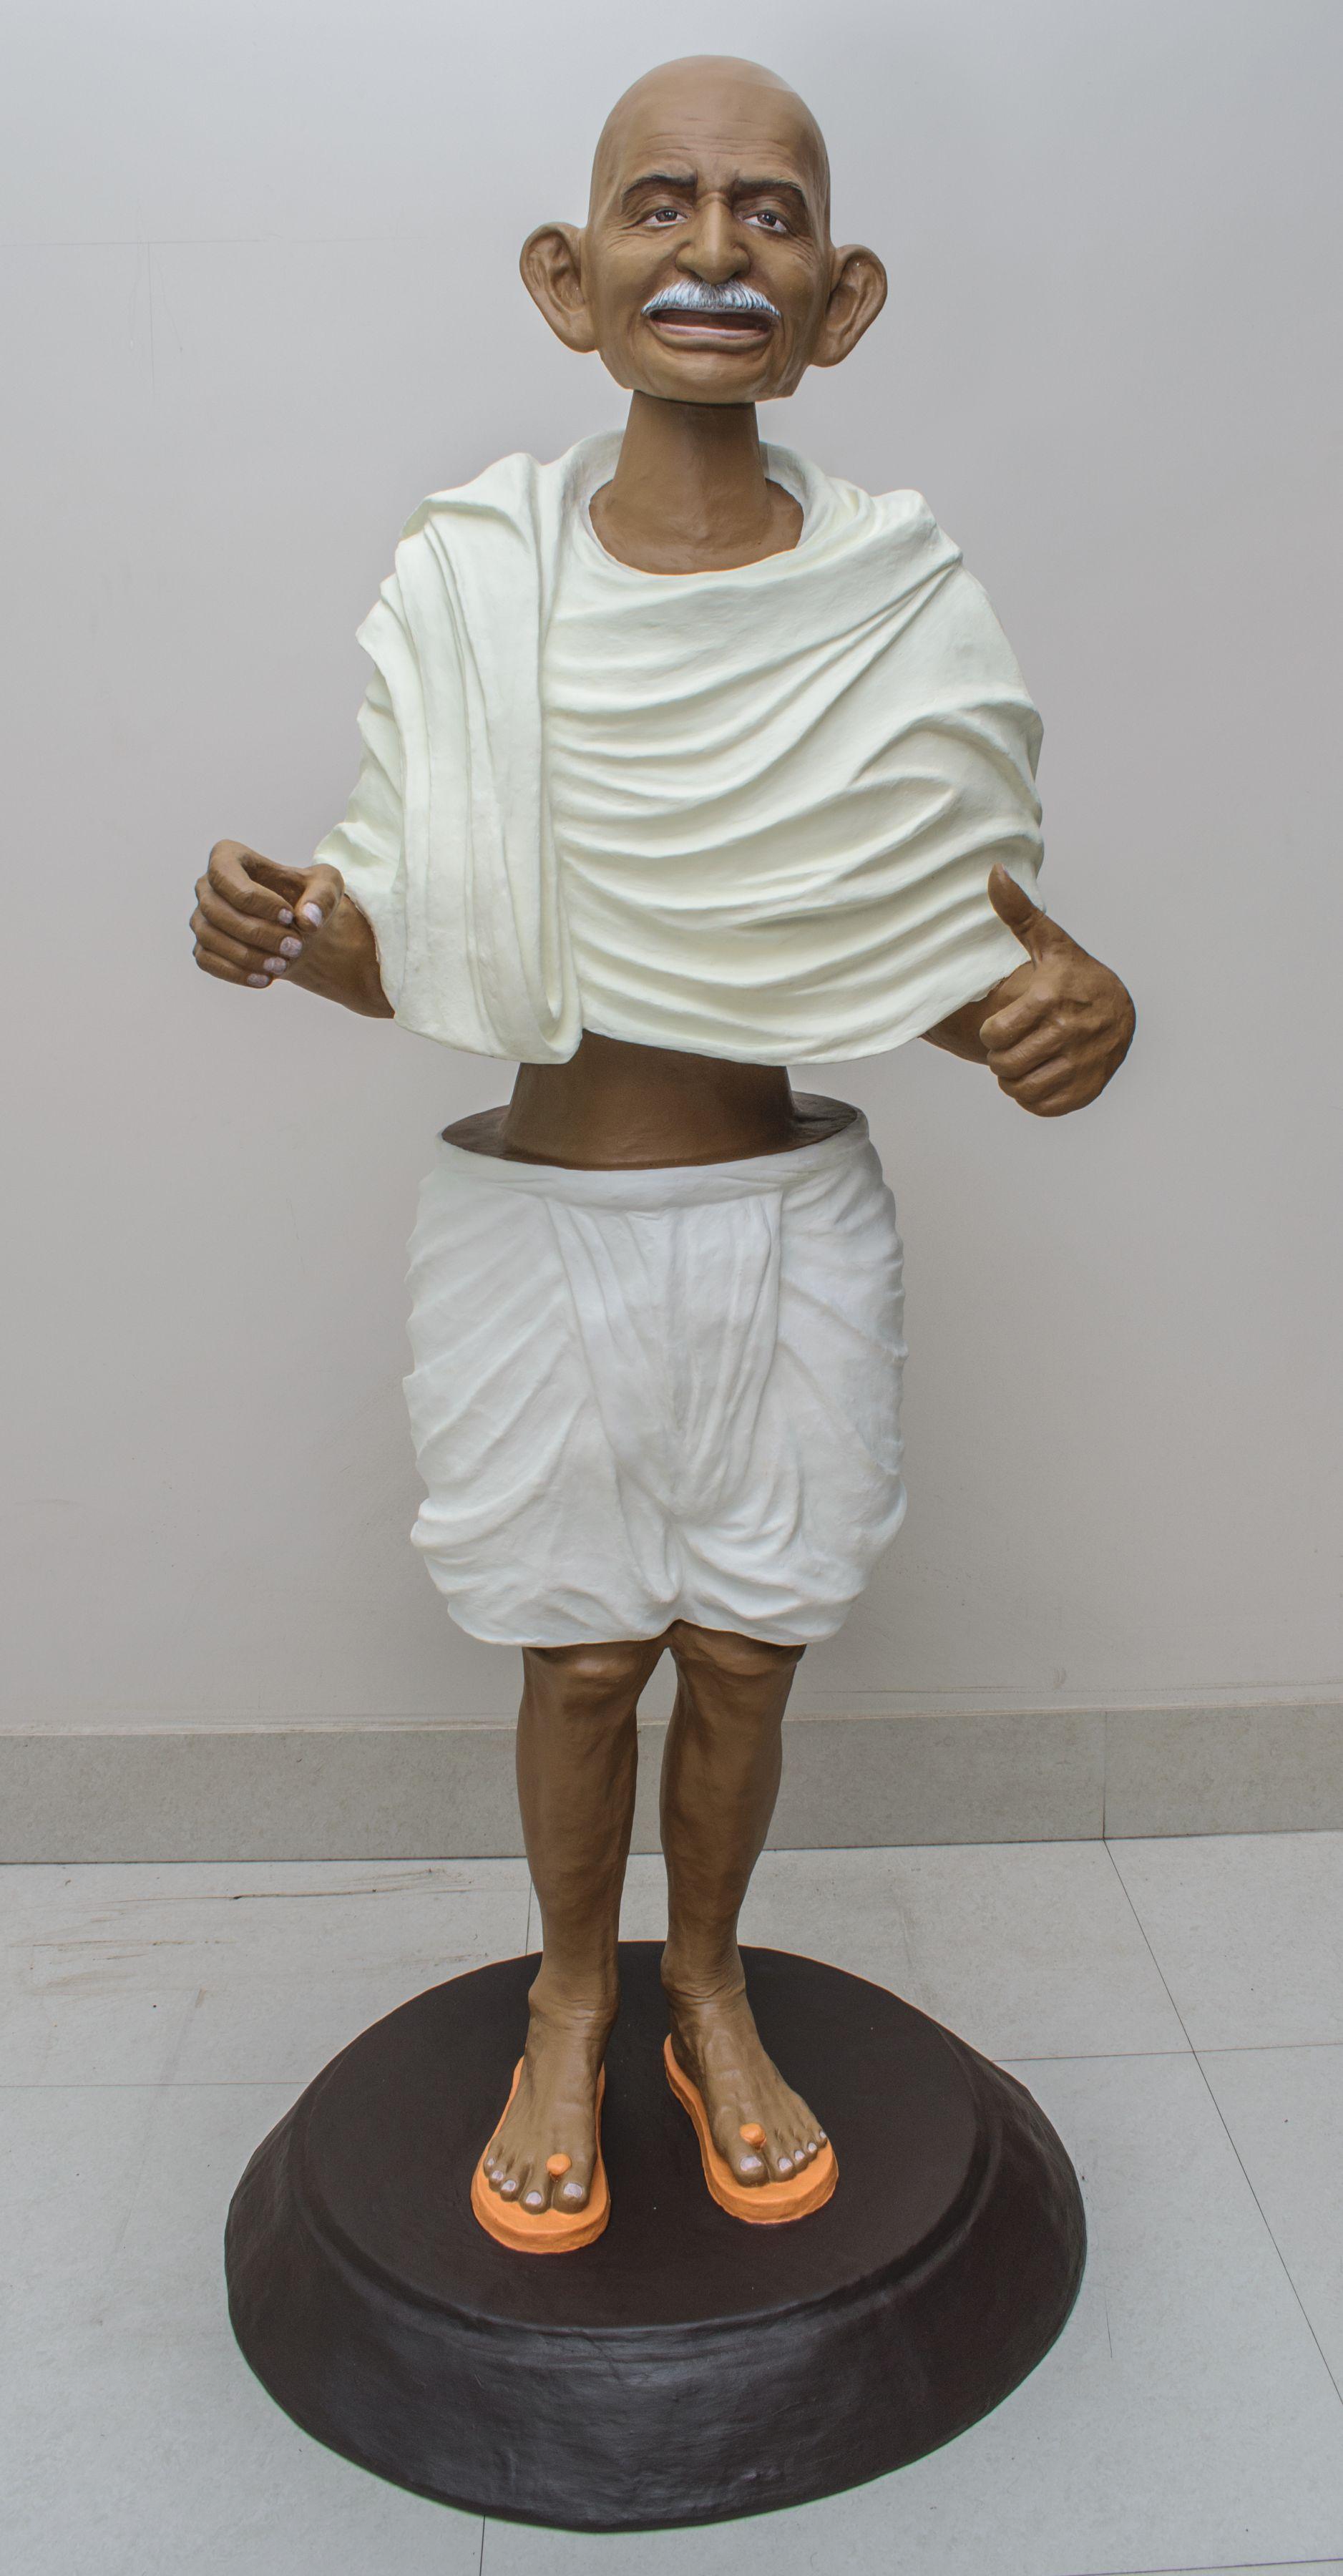 Toy Gandhi 6 (Bobble Head)